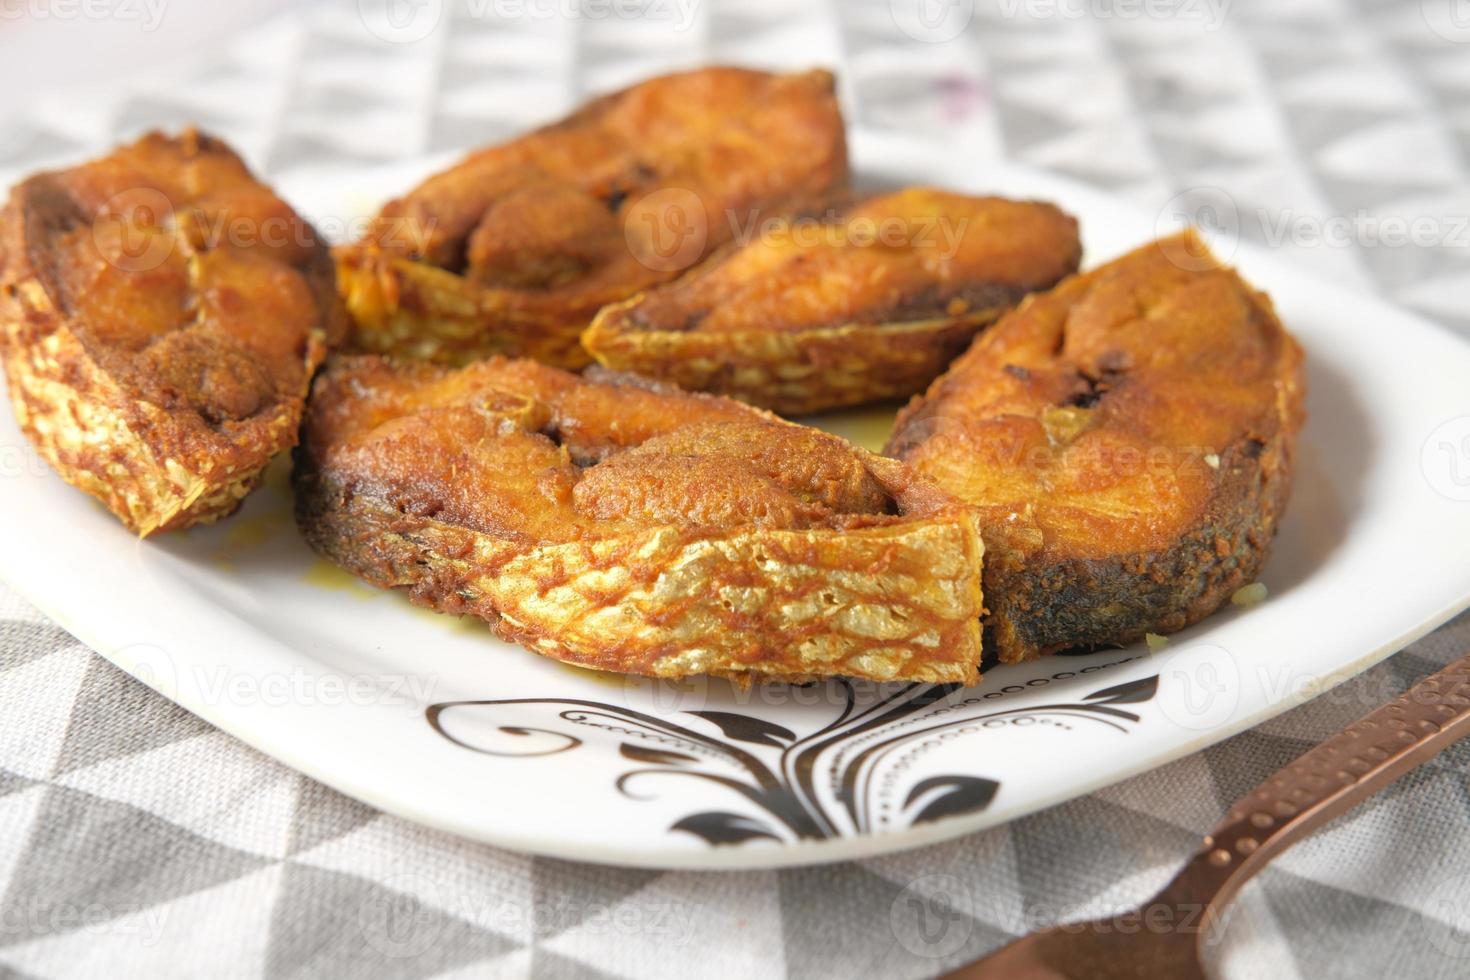 gekookte ilsha vis op plaat op tafel foto